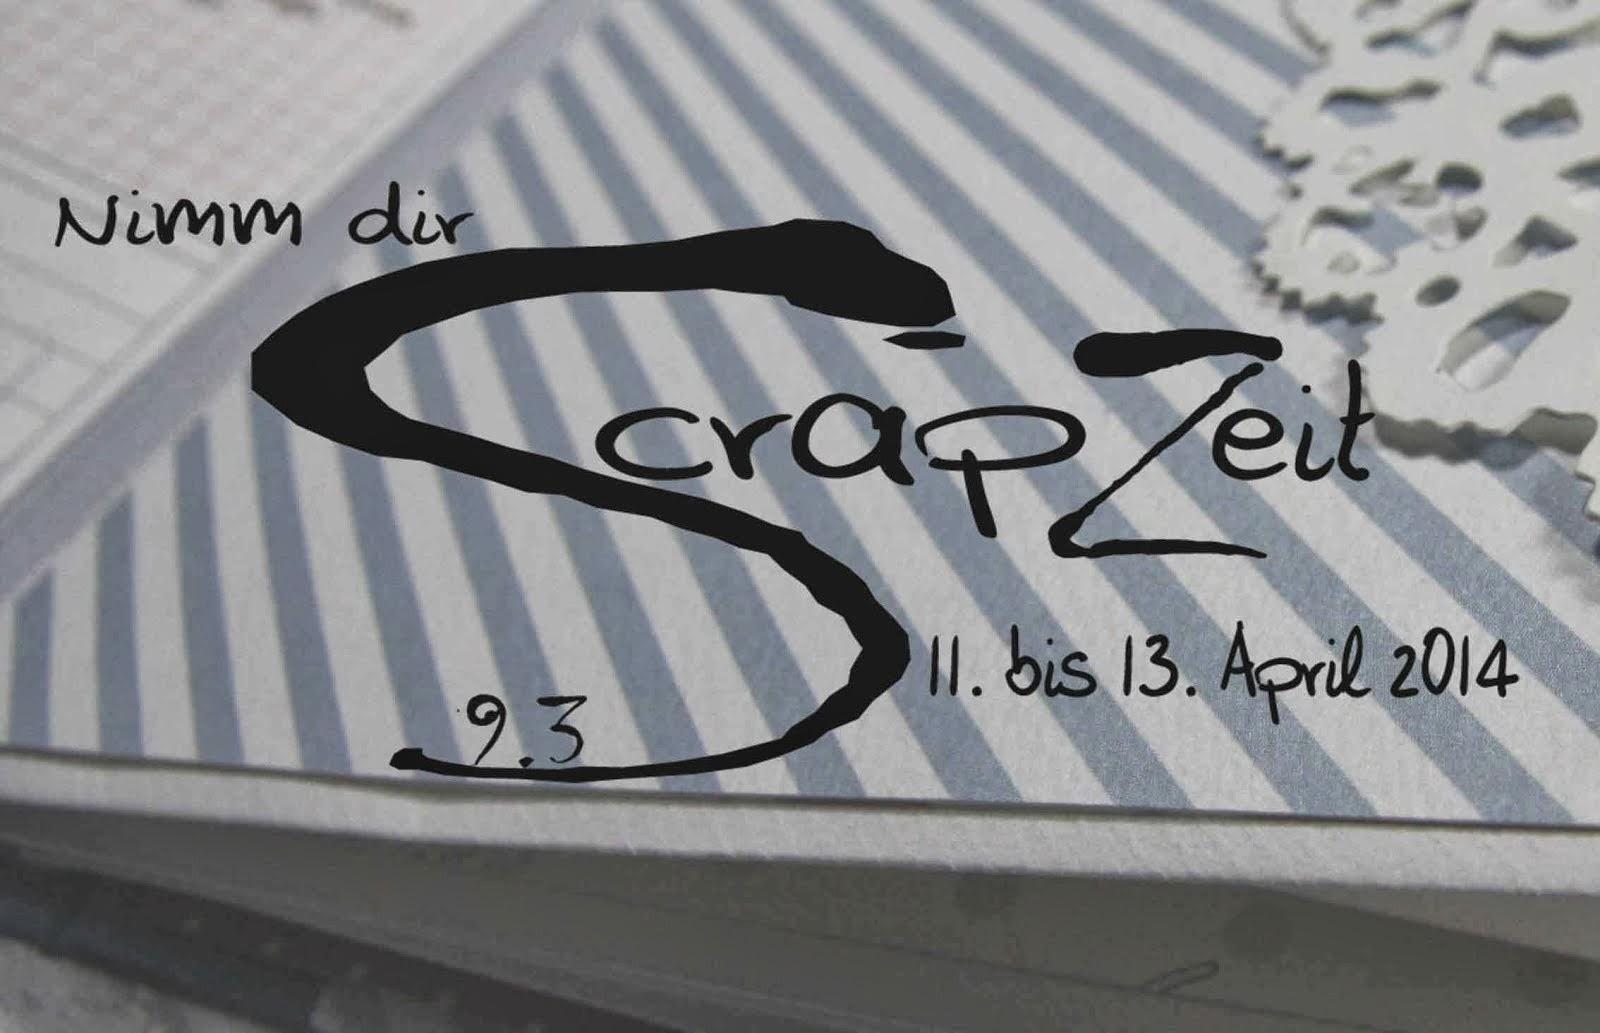 ScrapZeit 11.-13. April 2014